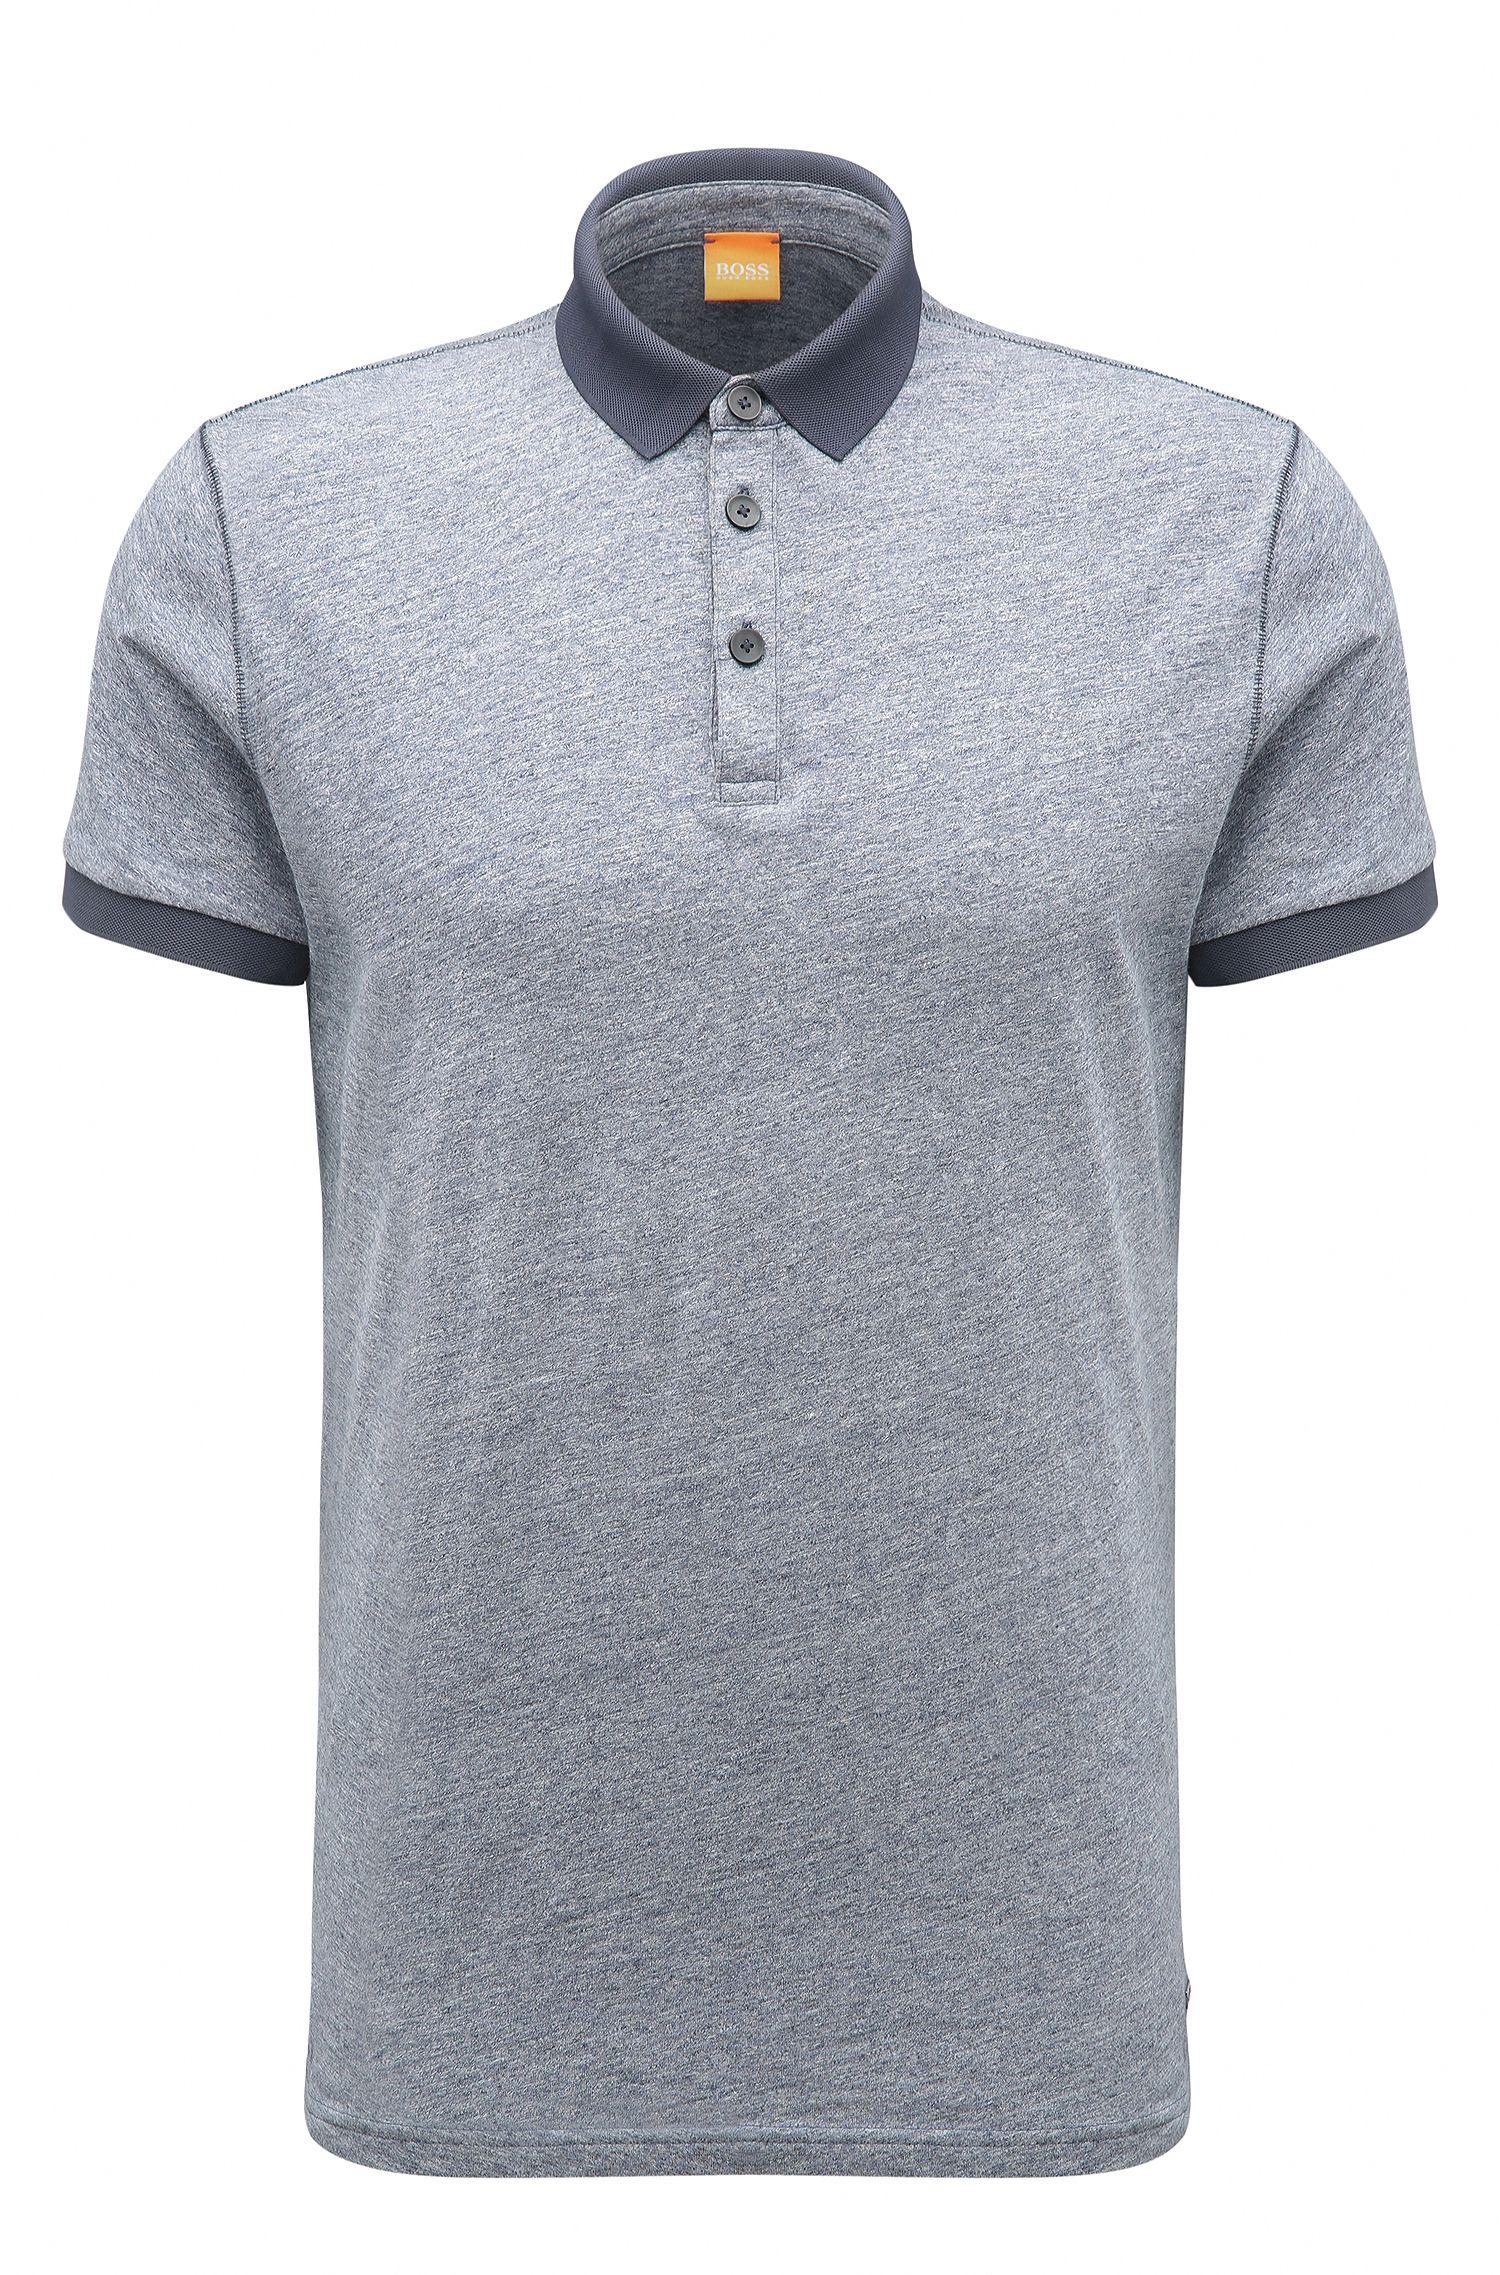 'Performer' | Regular Fit, Melange Cotton Polo Shirt